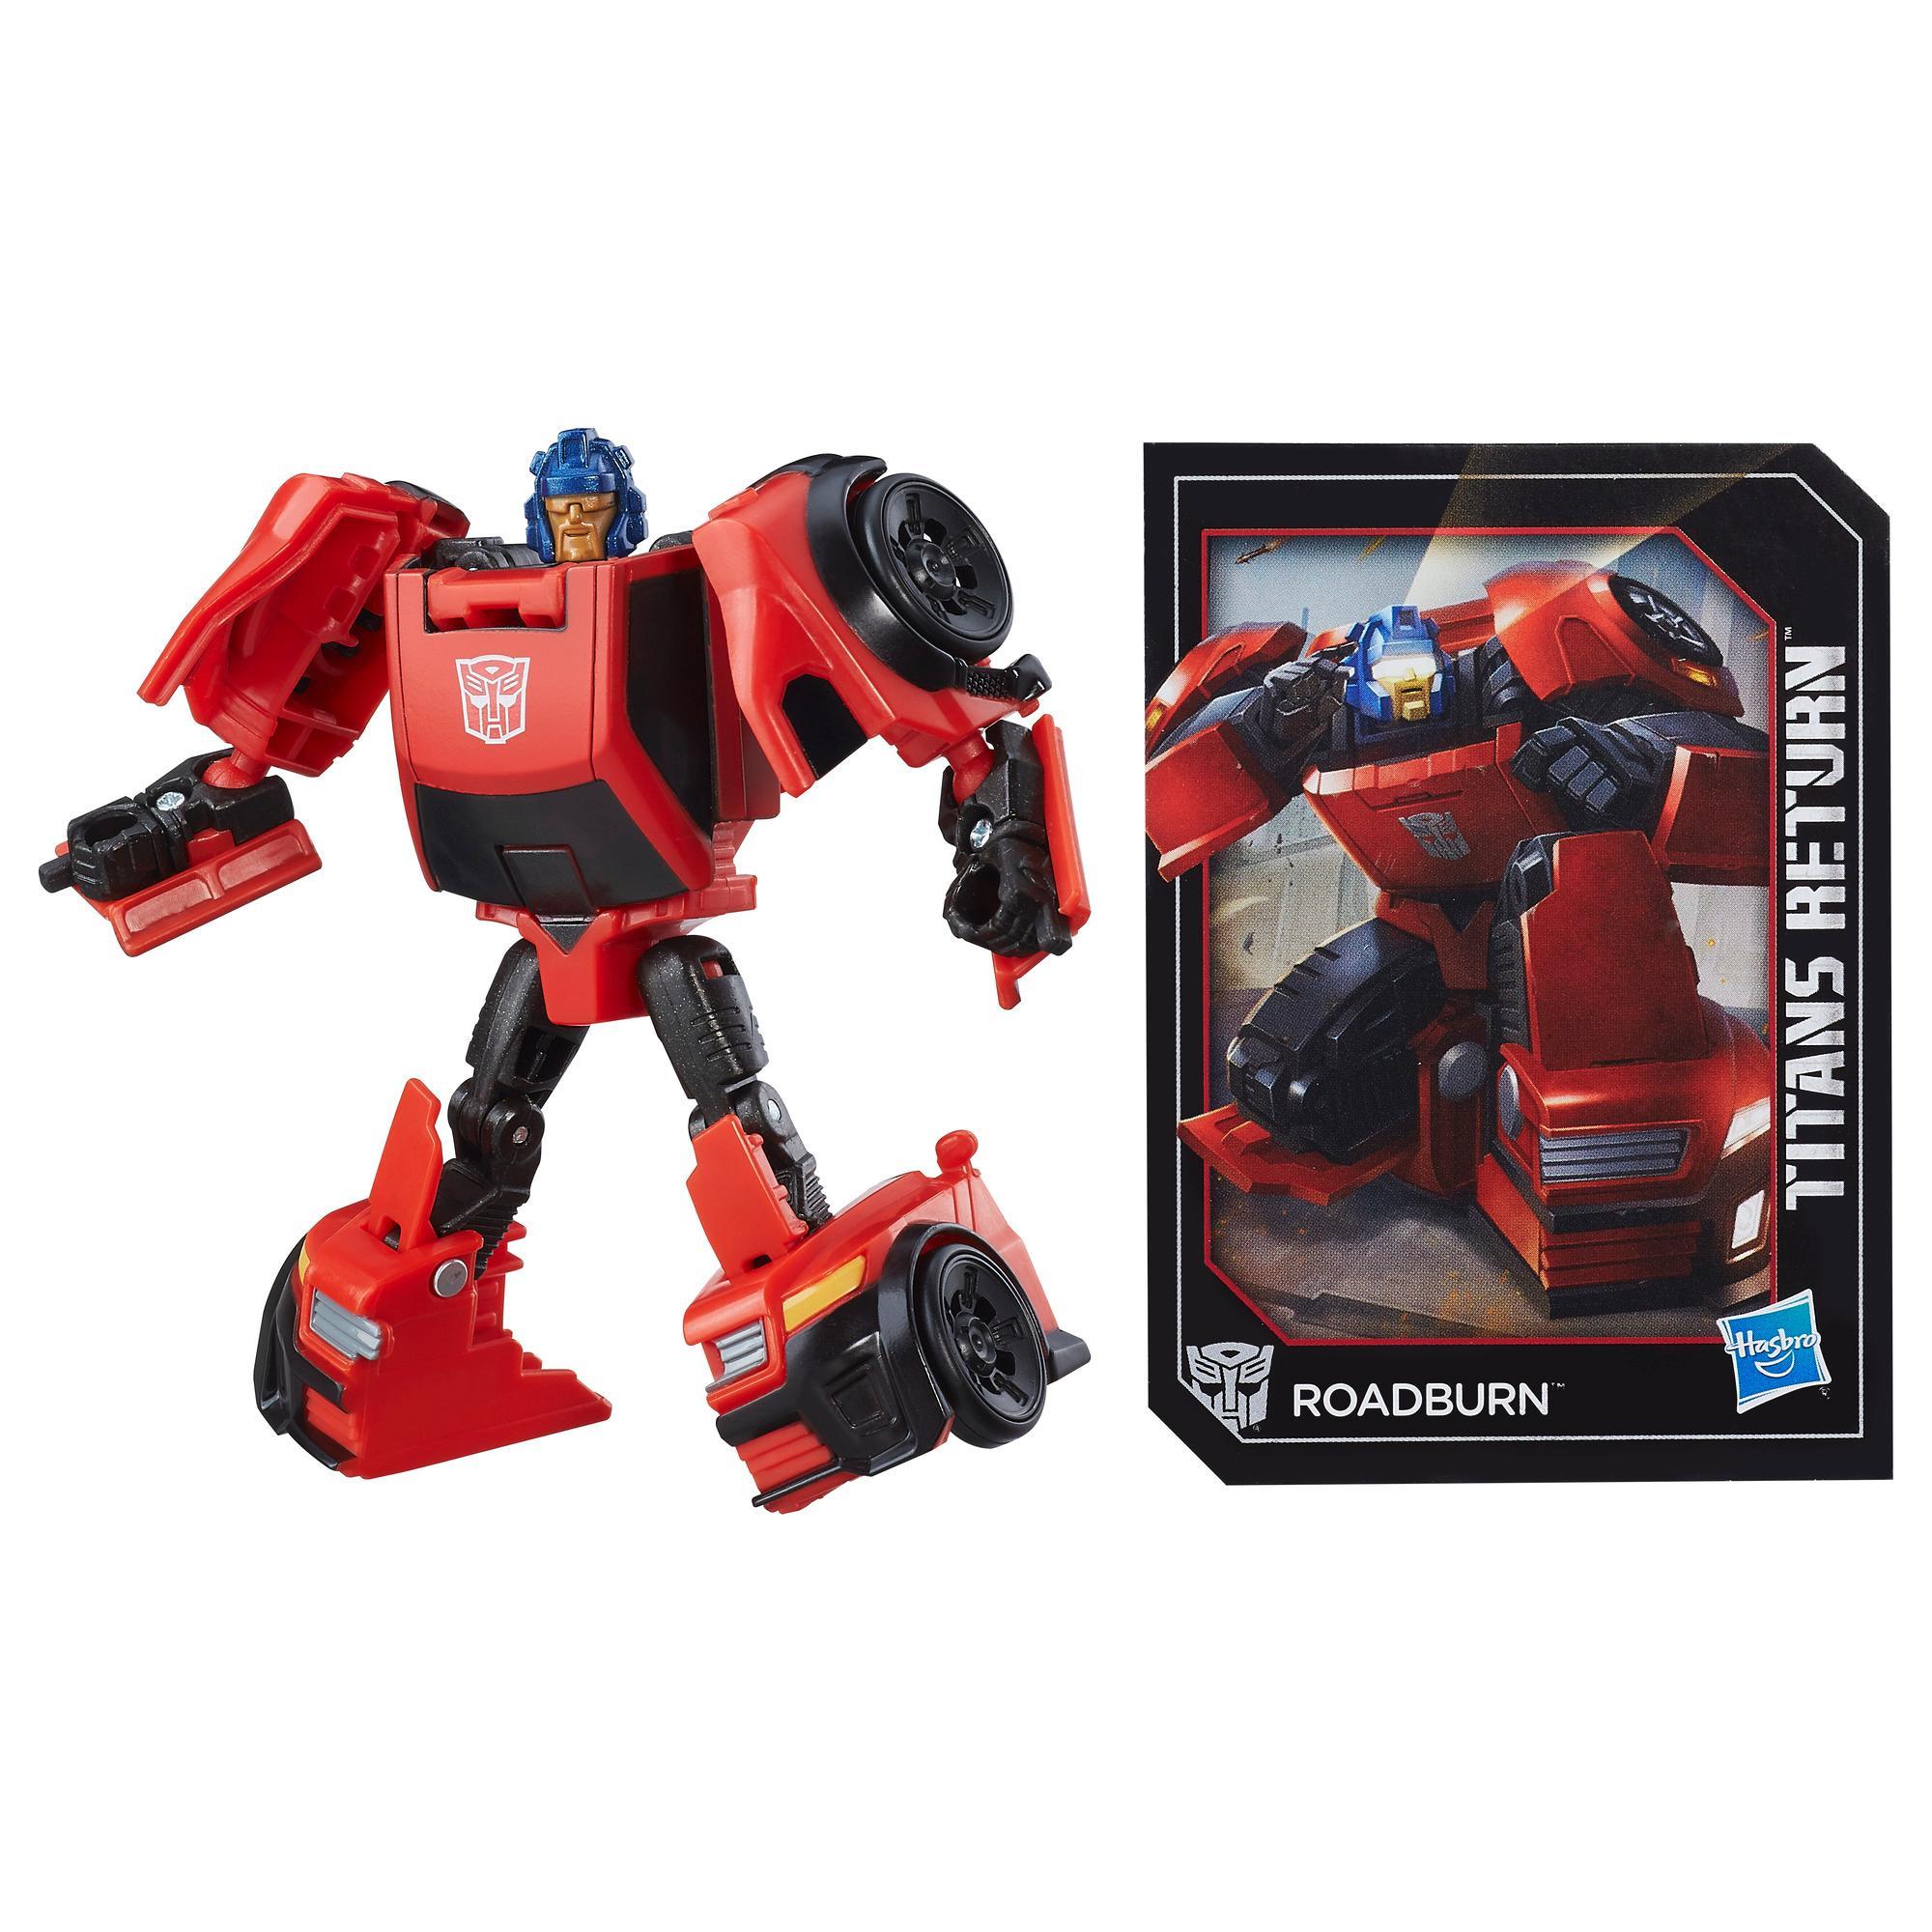 Transformers Generations Titans Return Roadburn